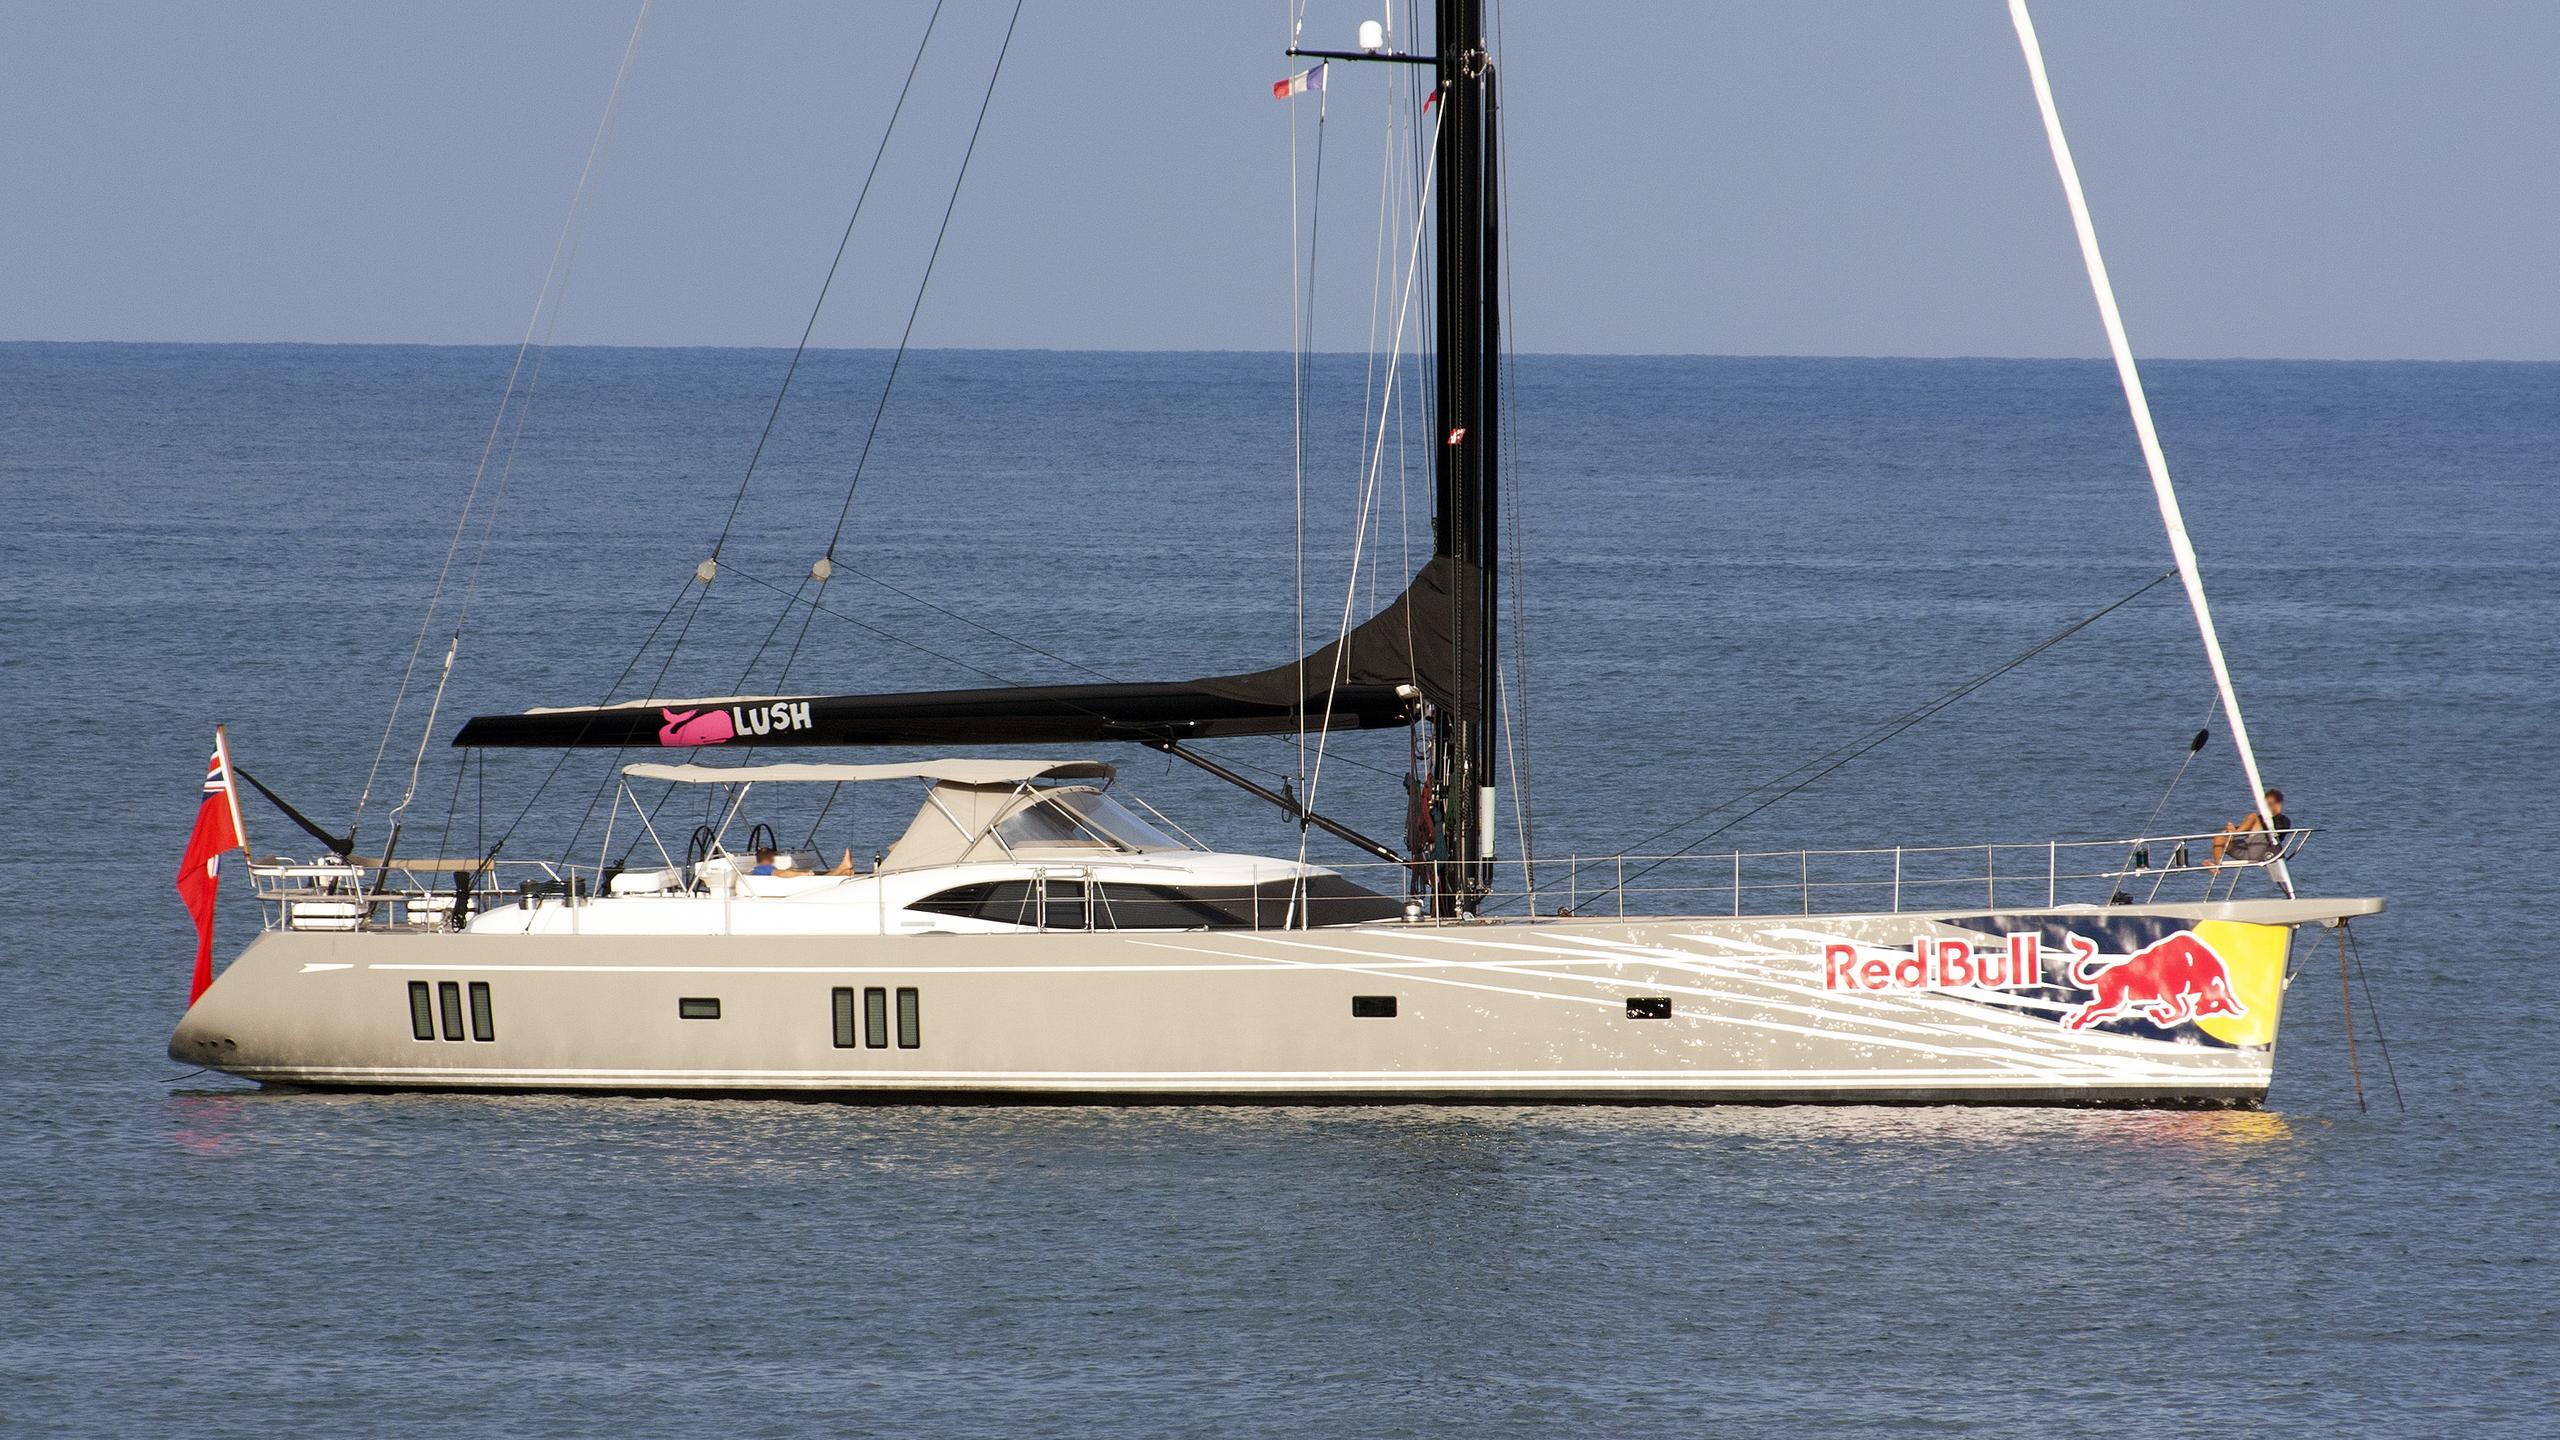 lush-sailing-yacht-Oyster-885-2012-27m-profile